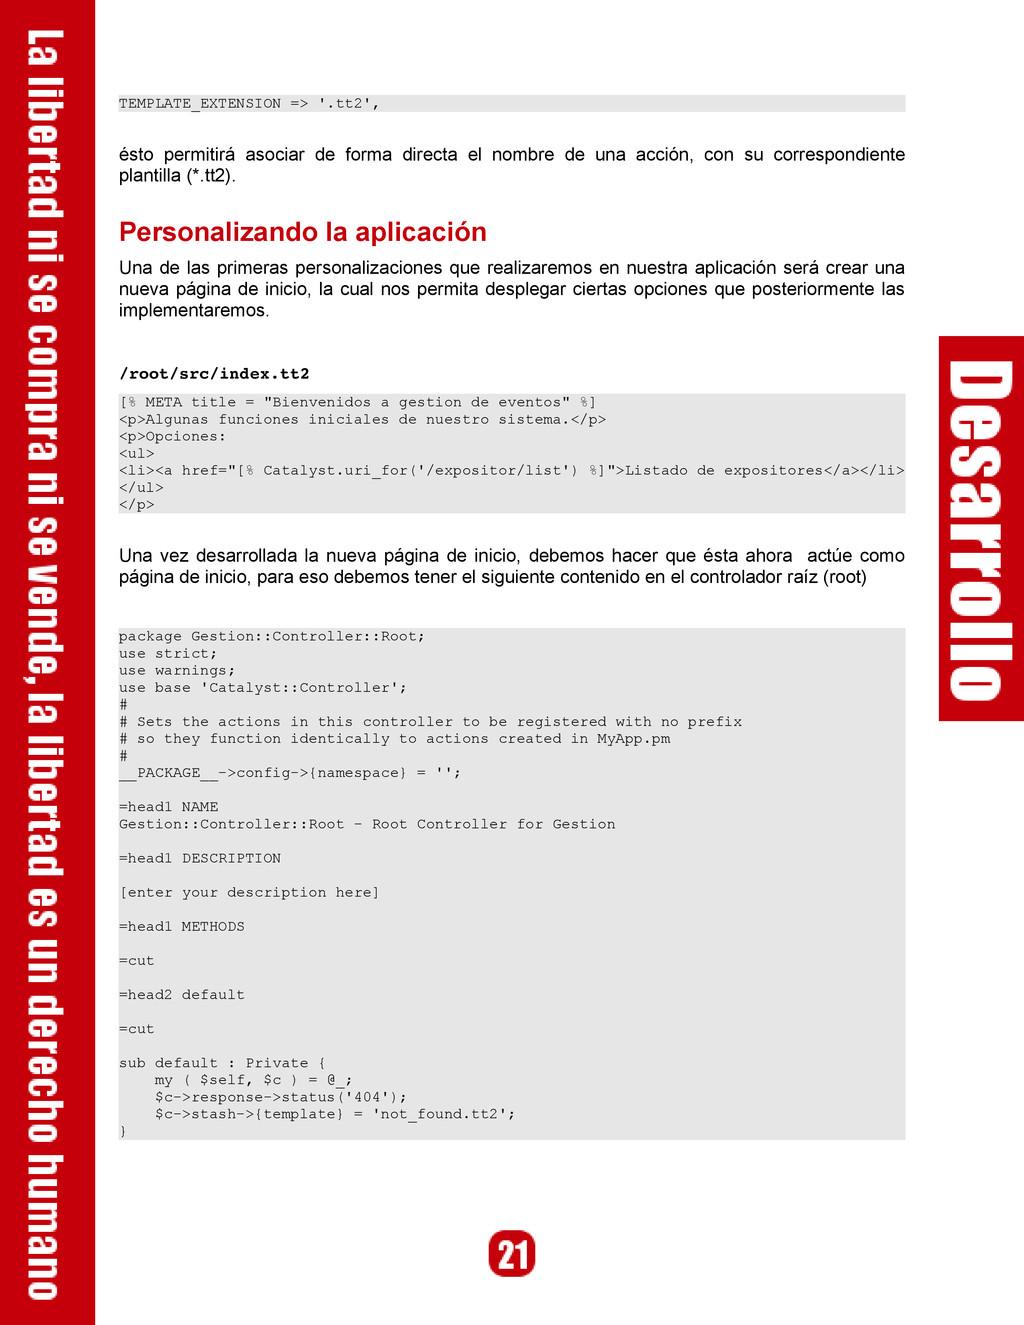 TEMPLATE_EXTENSION => '.tt2', ésto permitirá as...